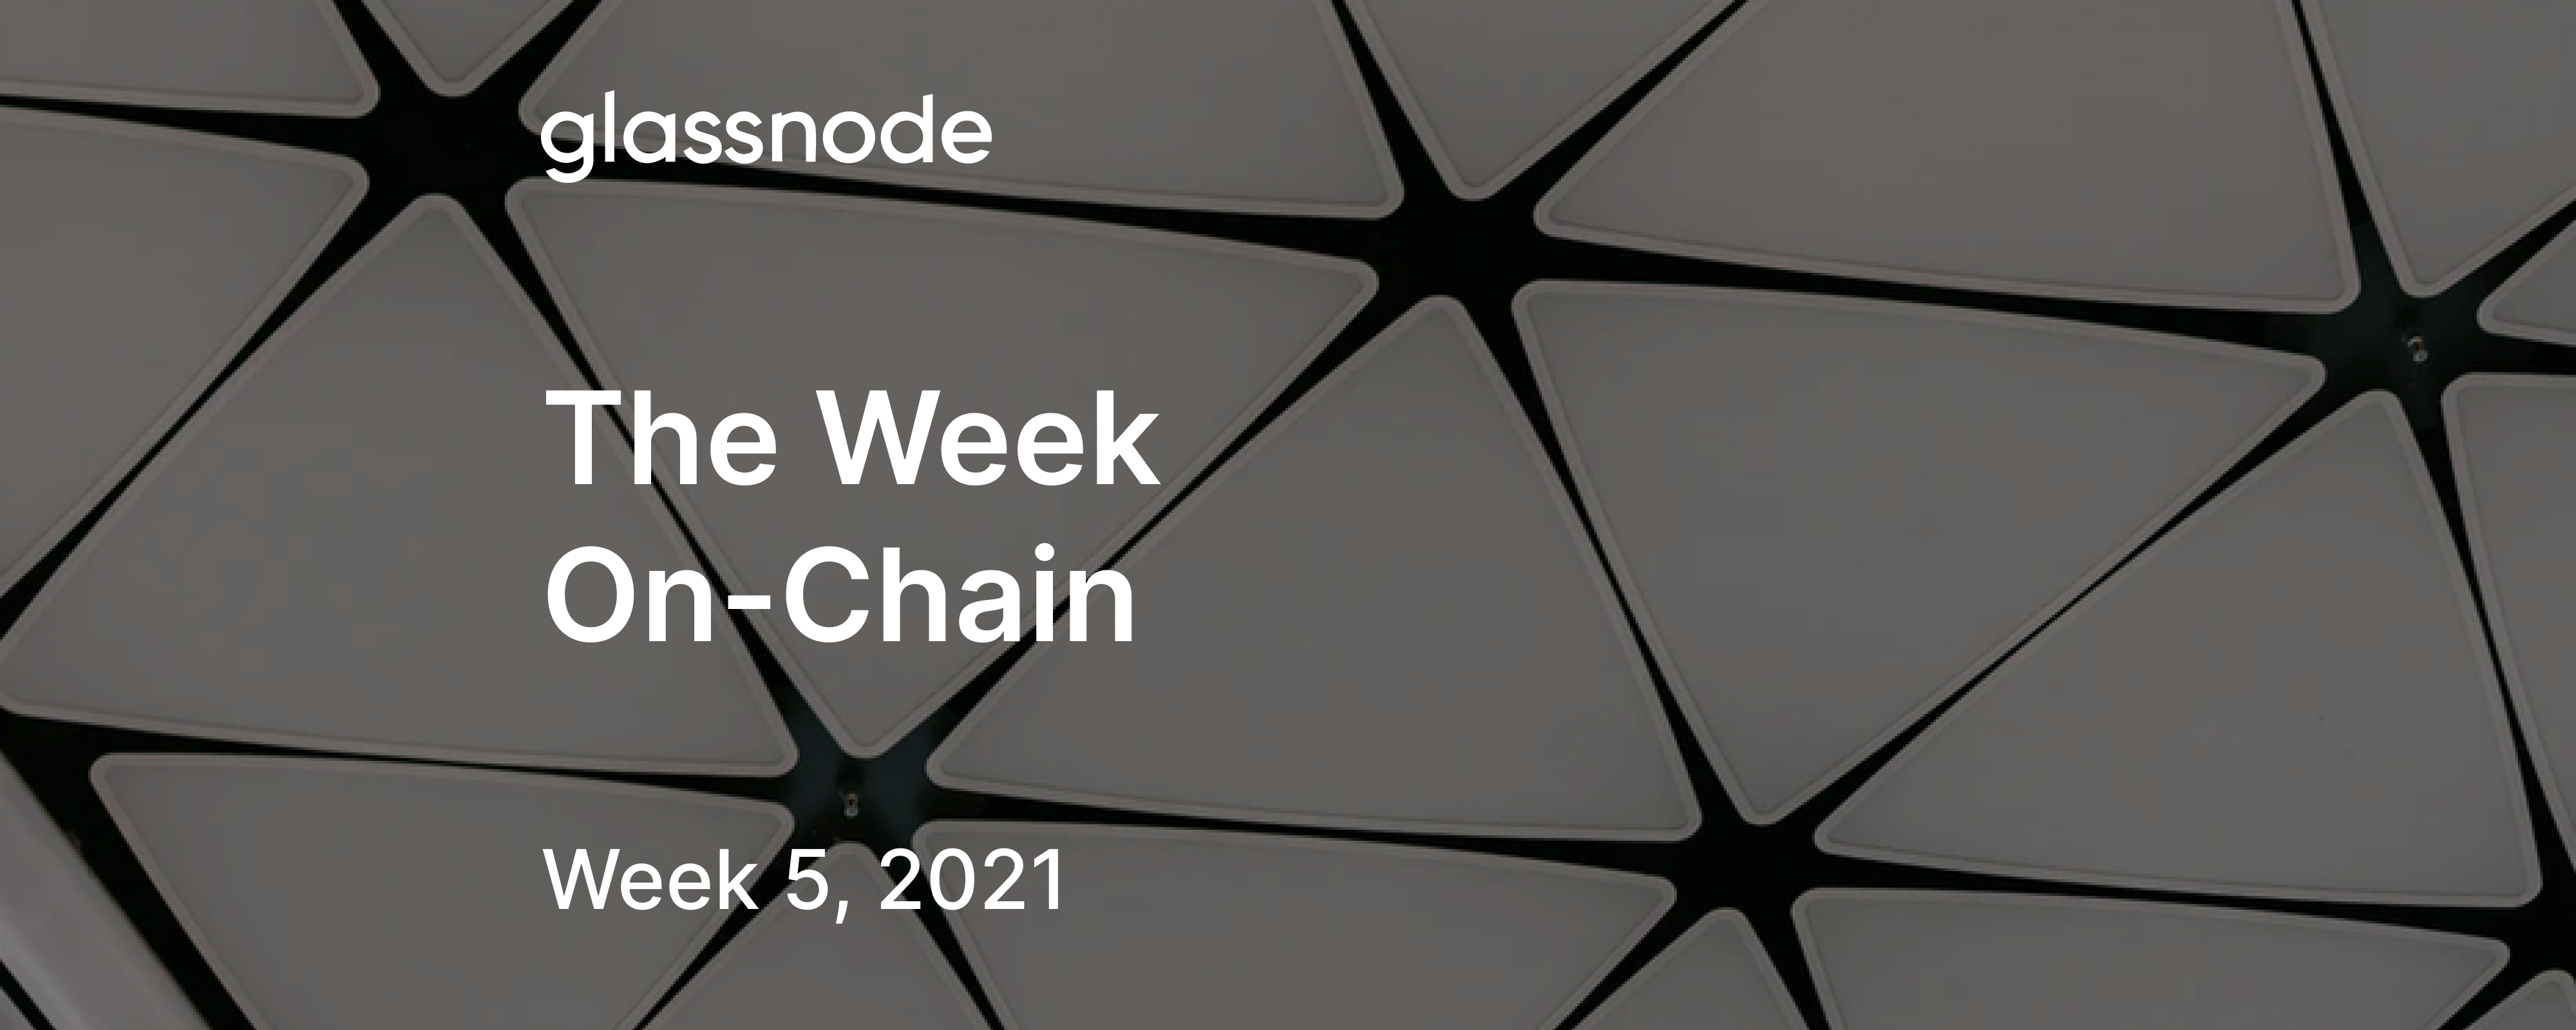 The Week On-Chain (Week 5, 2021)